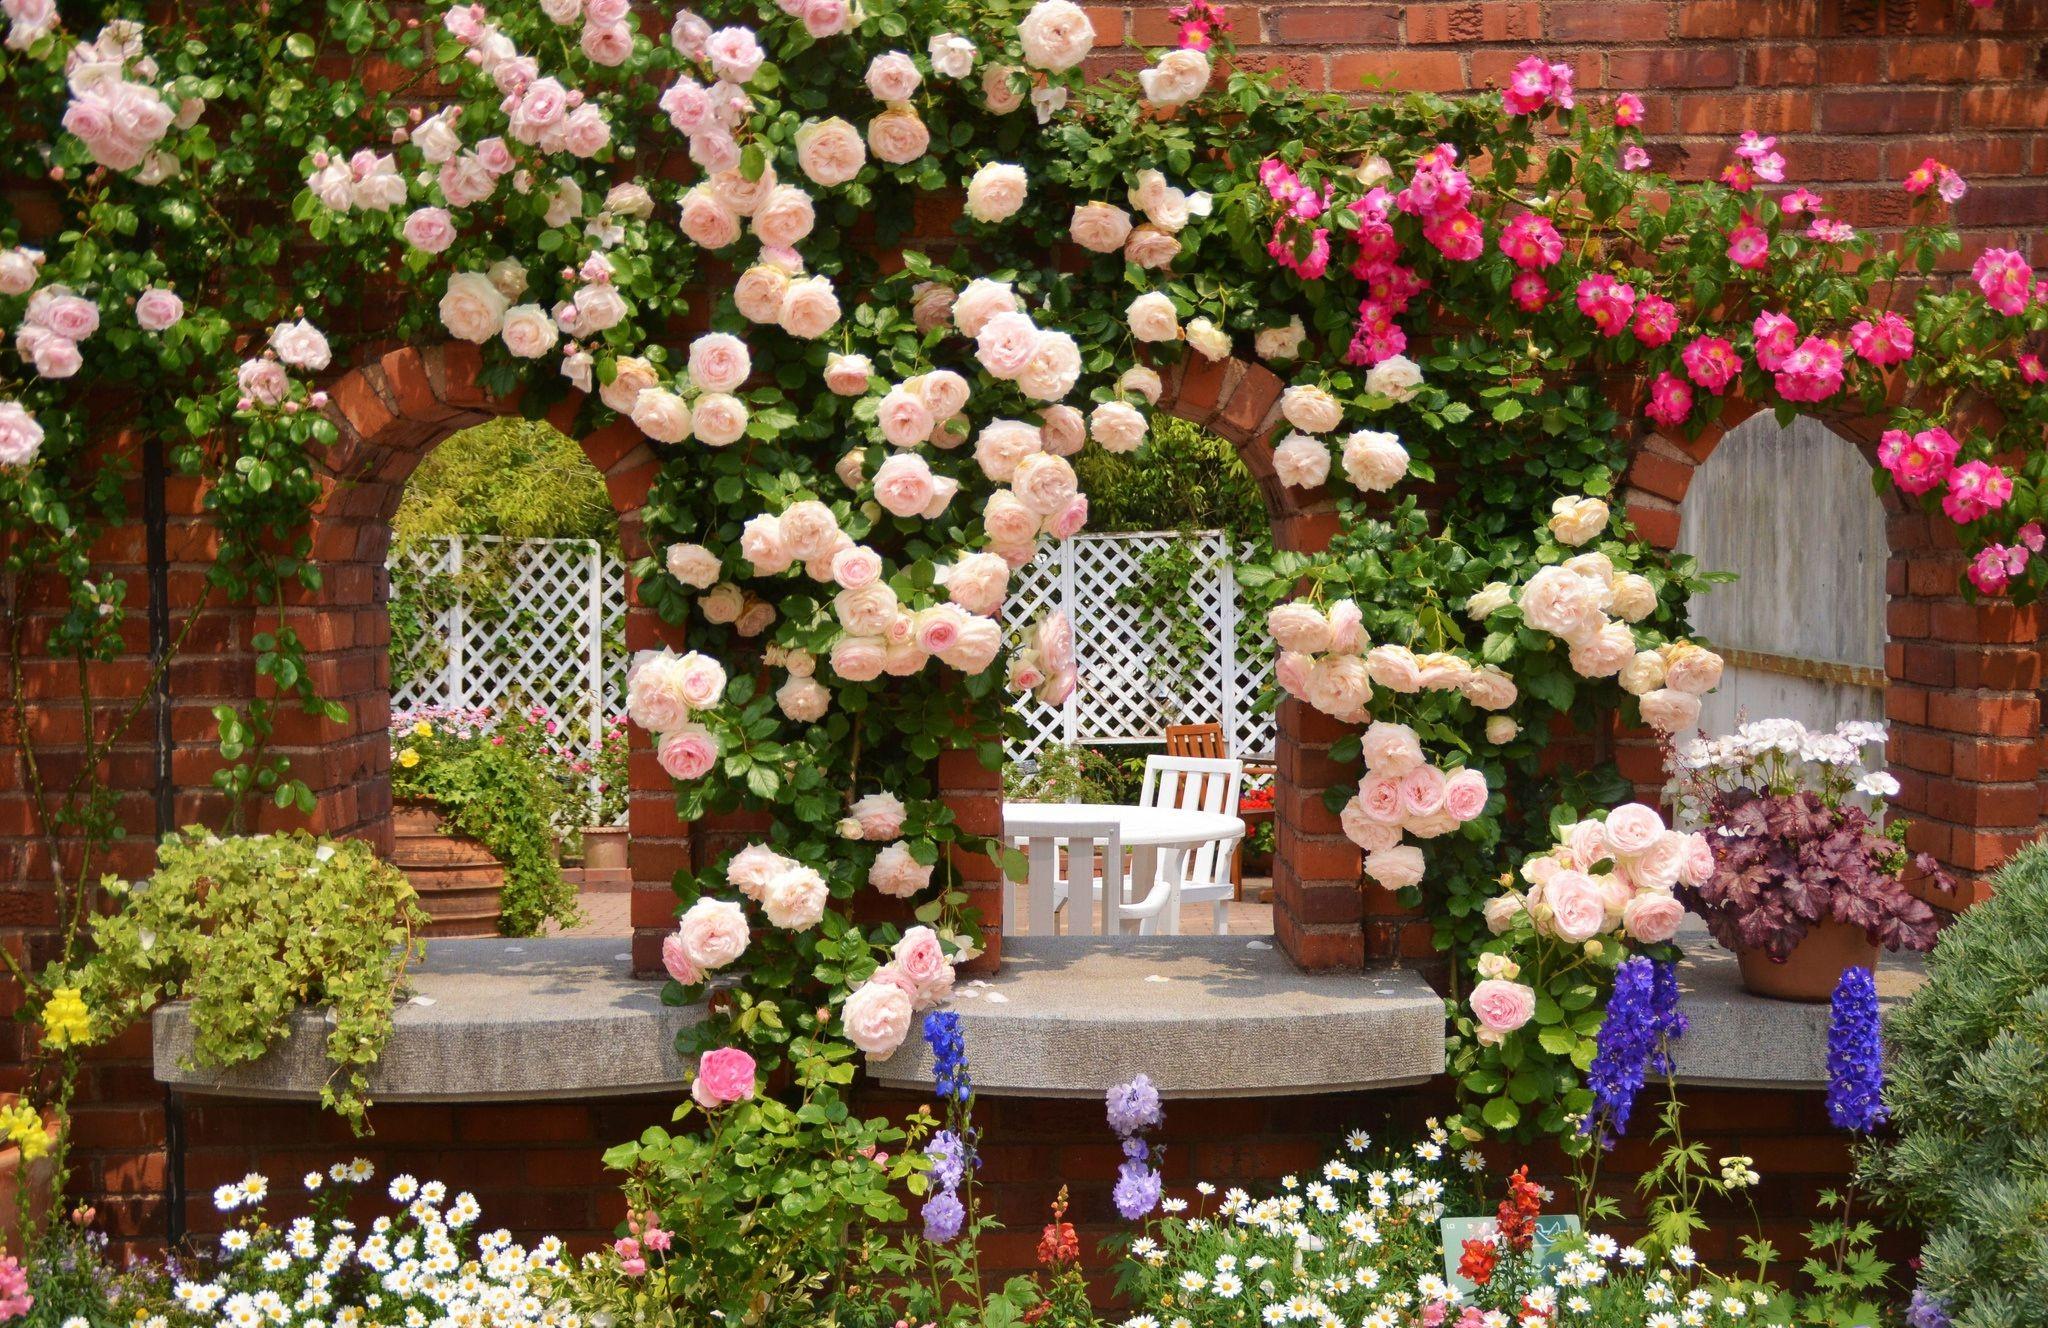 2048x1328 Rose Garden Desktop Background | 1750 | Hostelgarden.net